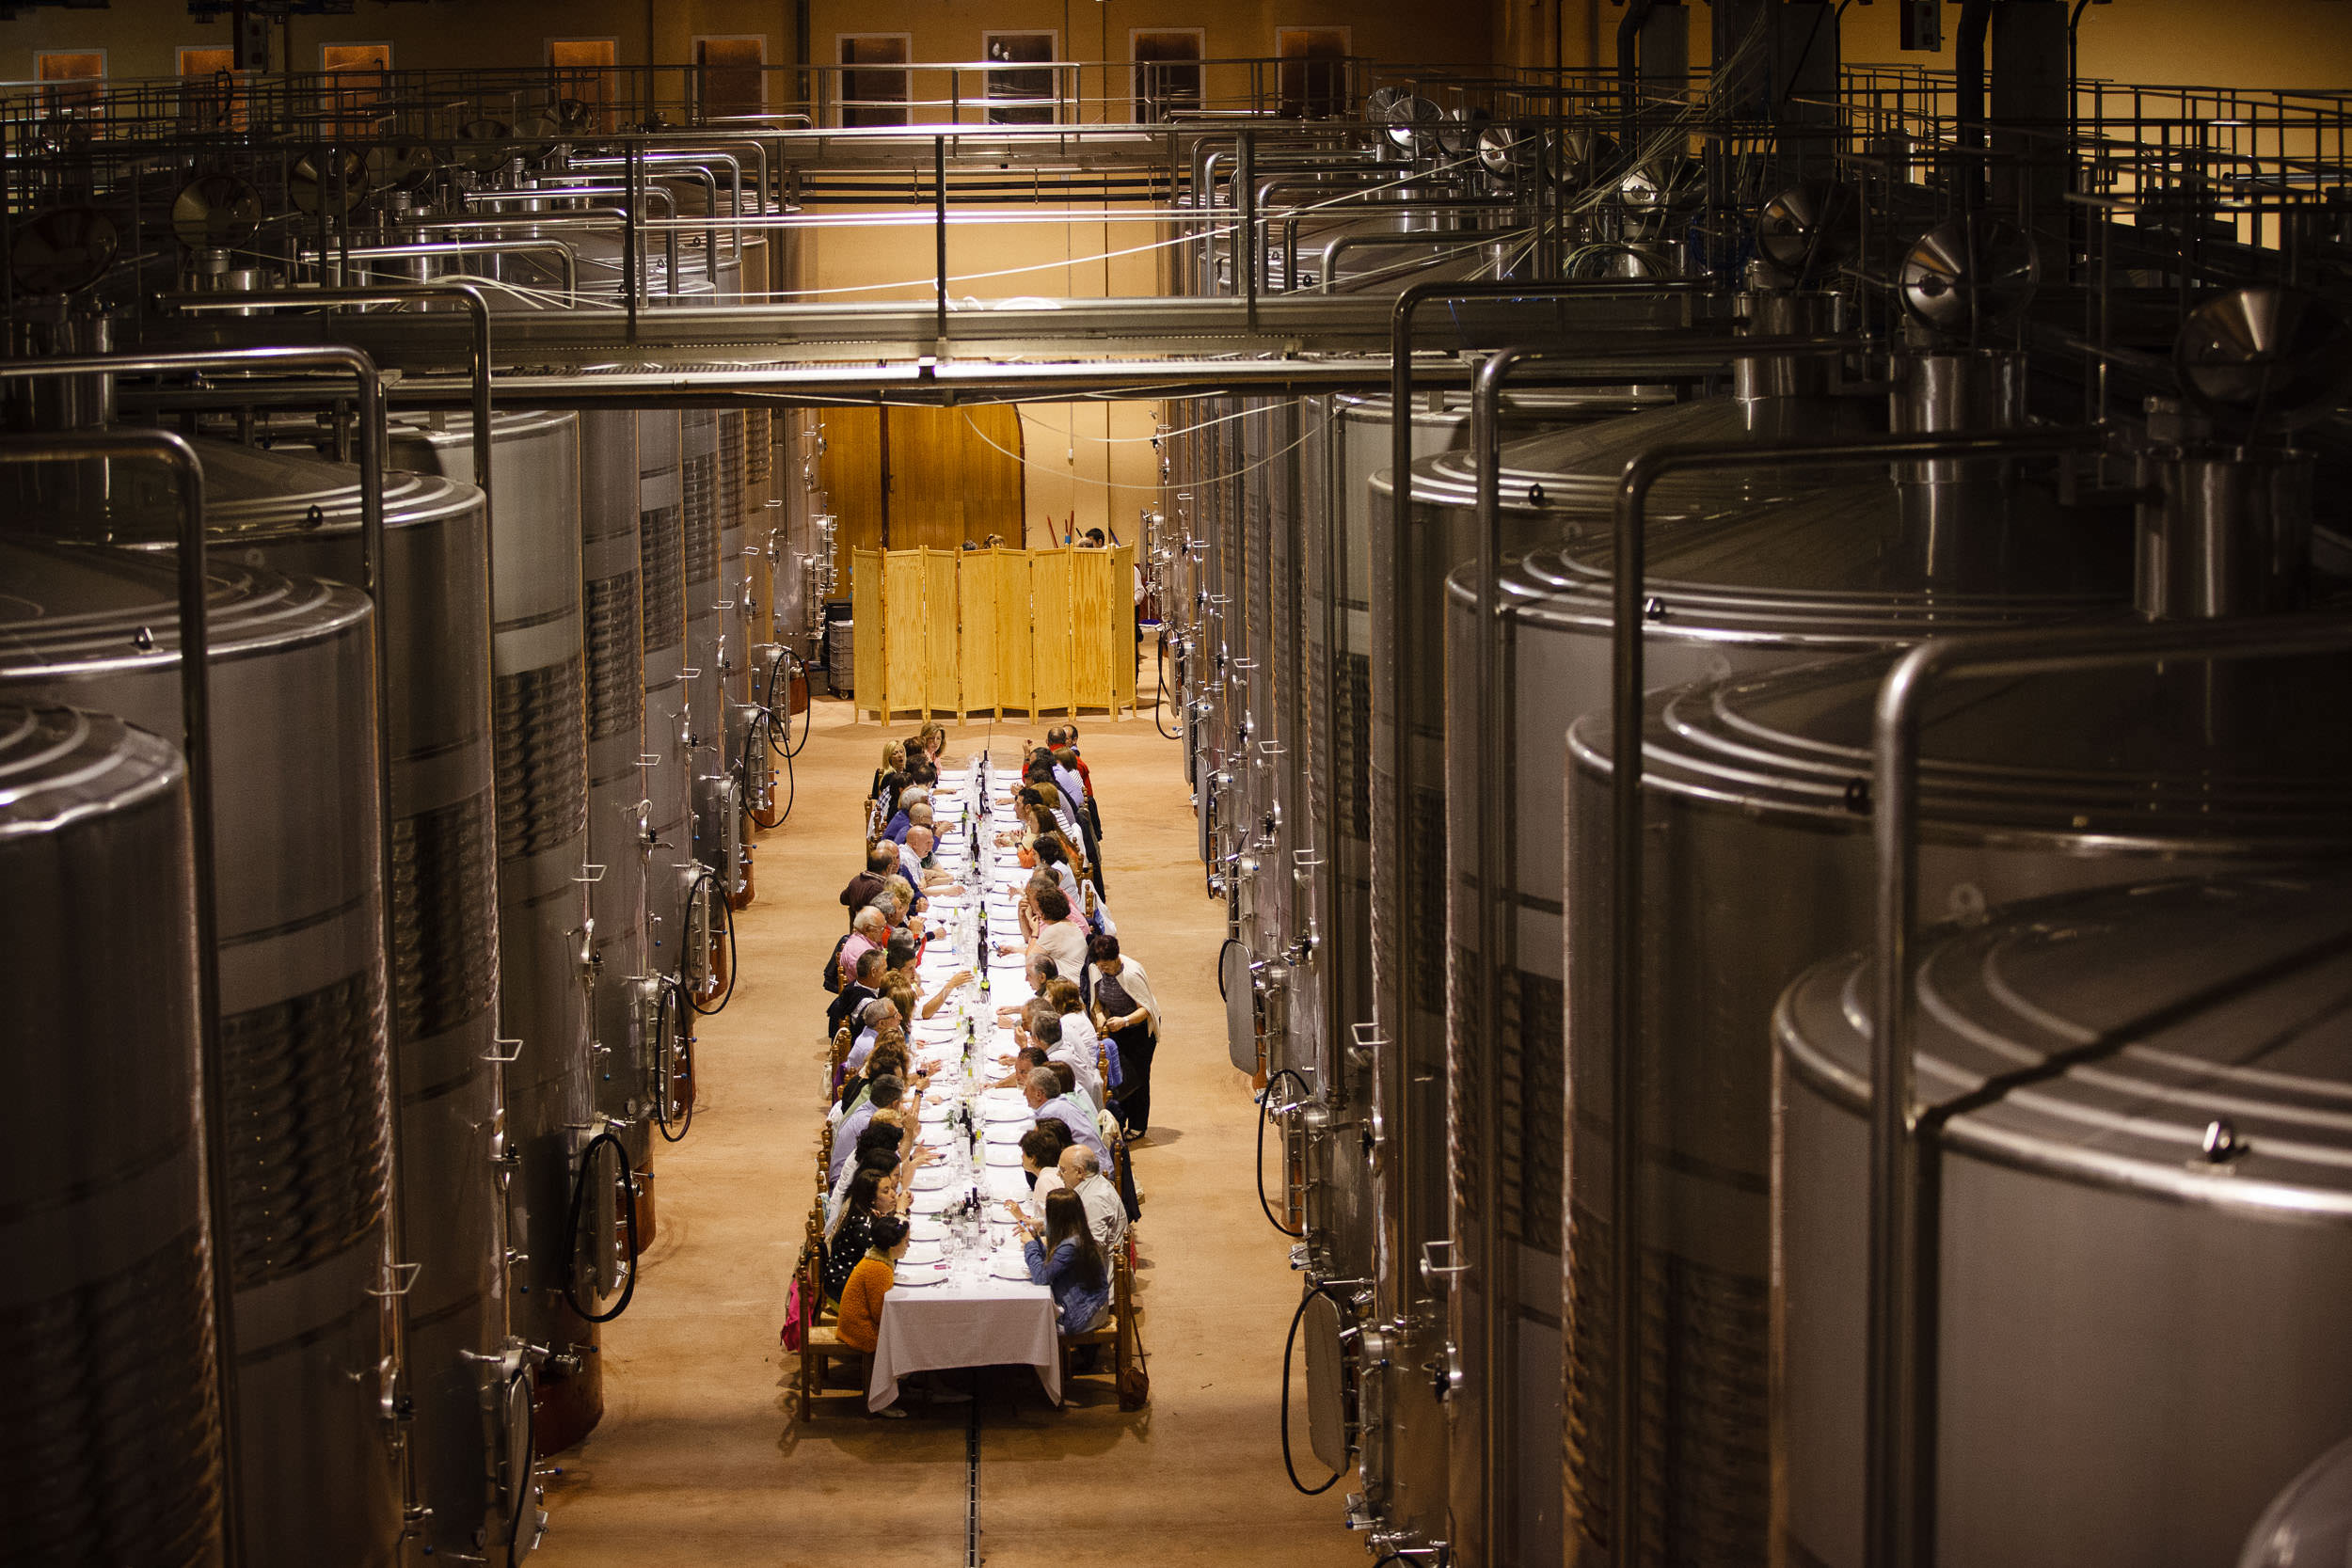 Fotografia Comercial de Vino La Rioja - Bodegas San Pedro Apostol Huercanos - James Sturcke Photographer | sturcke.org_004.jpg